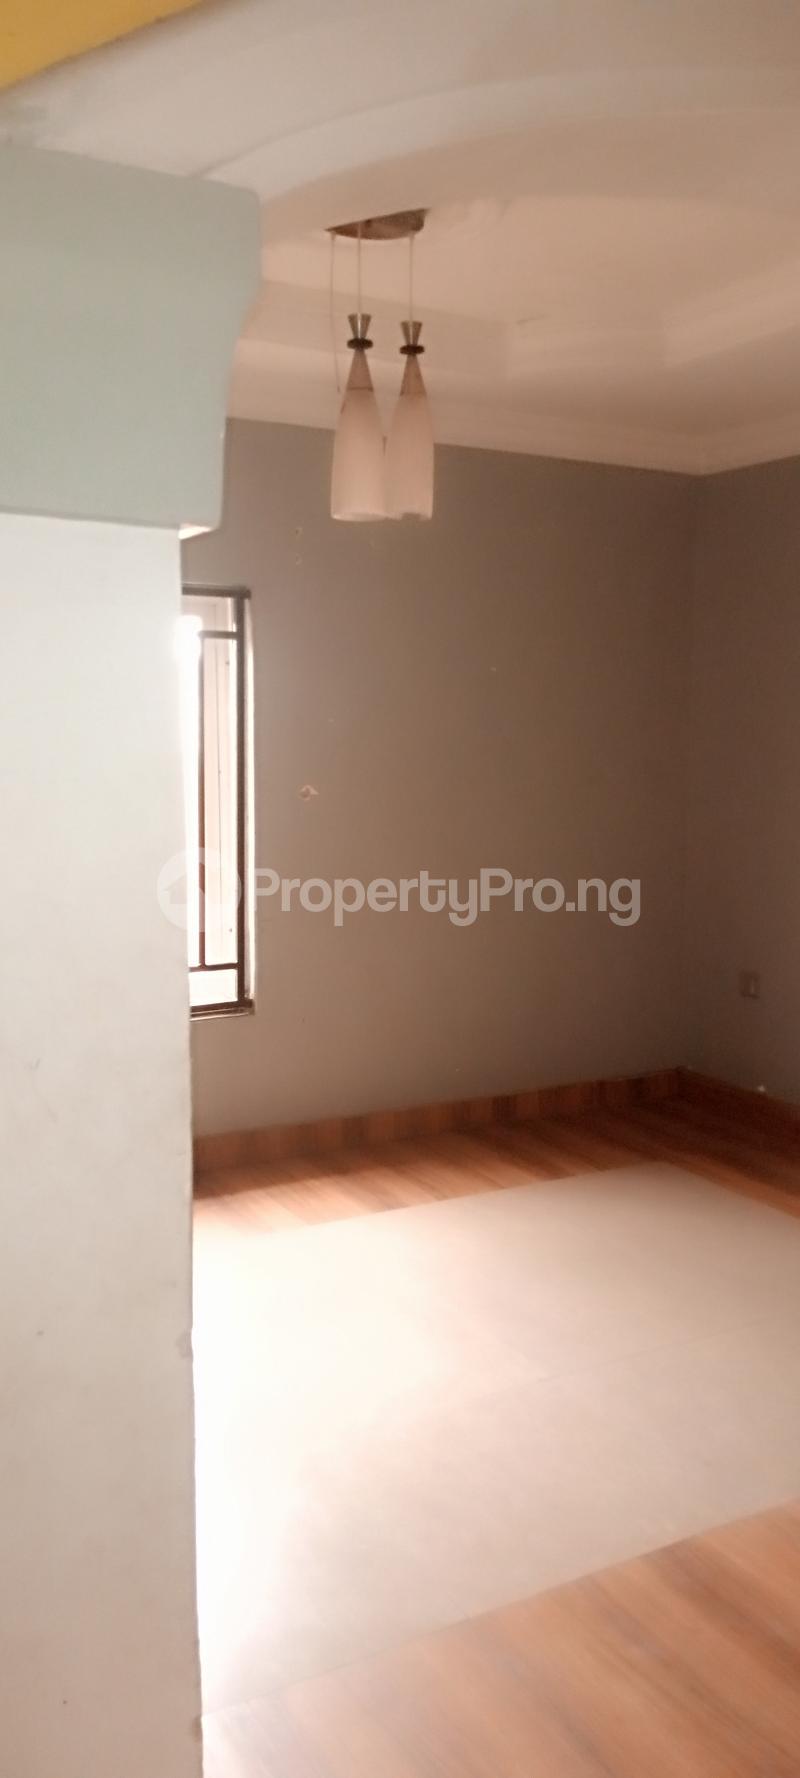 5 bedroom House for rent Estate drive Omole phase 2 Ojodu Lagos - 16